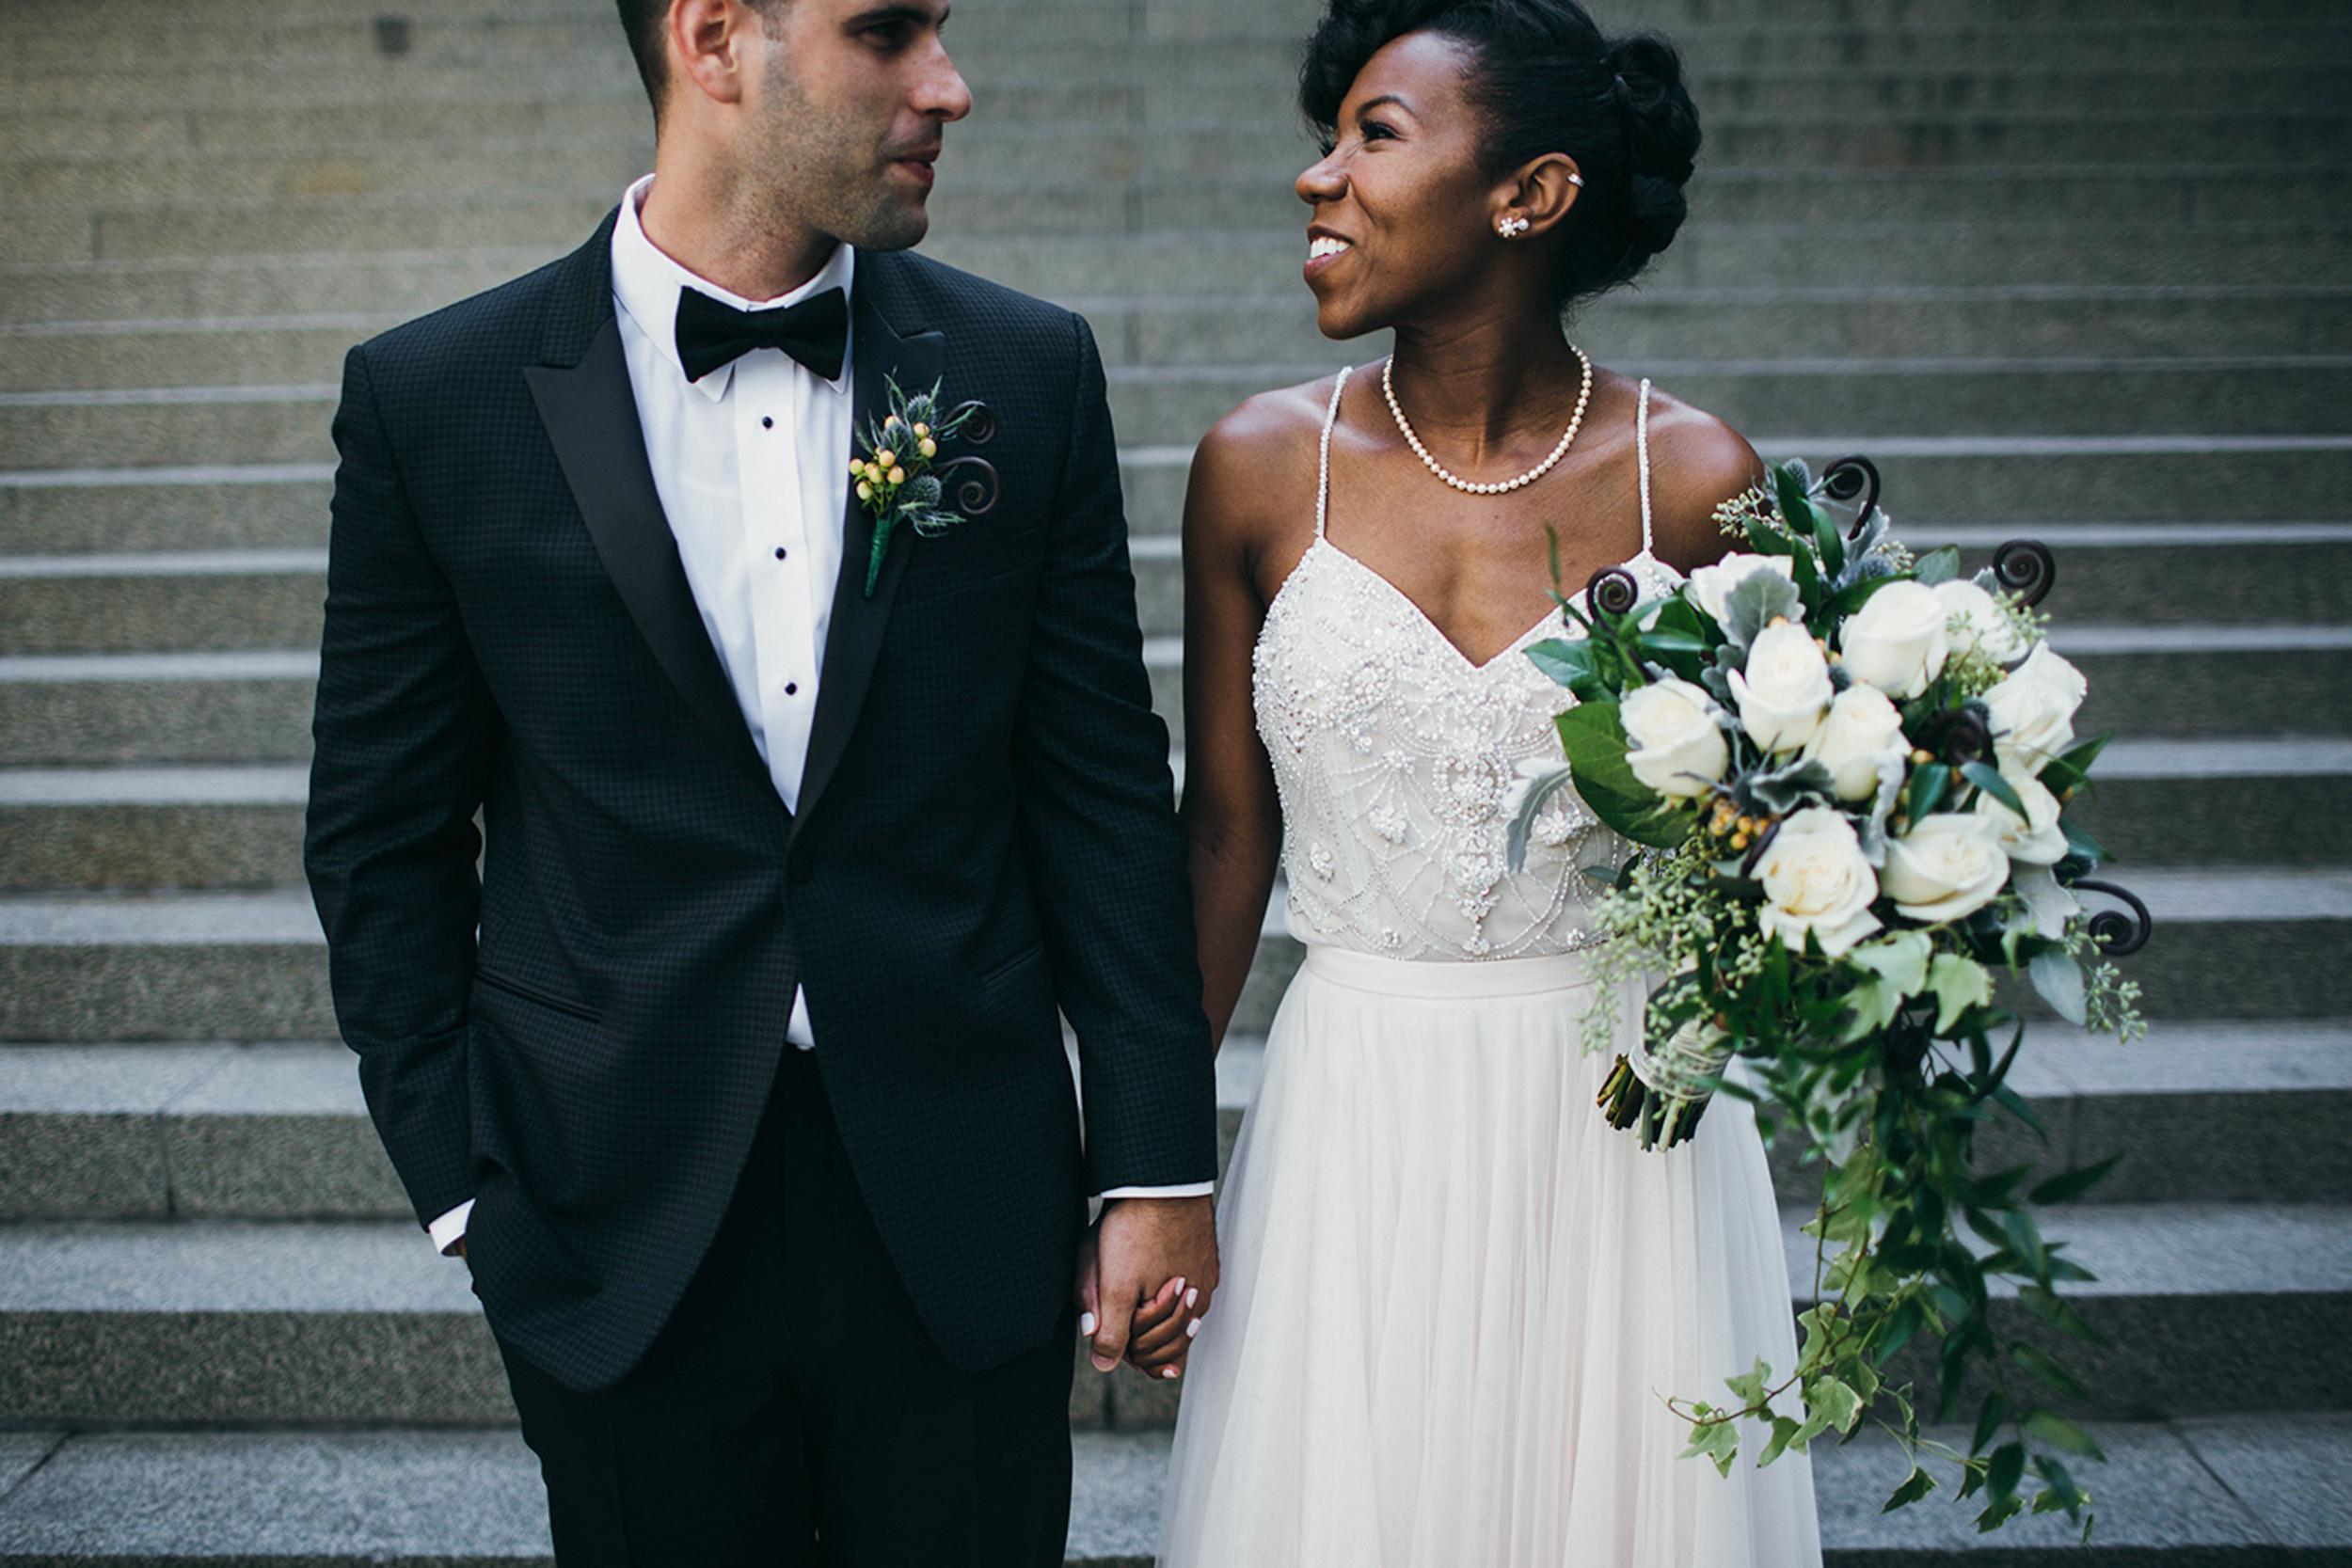 chicago.wedding.urban.intimate.zed451.lake.milton olive park-29.jpg